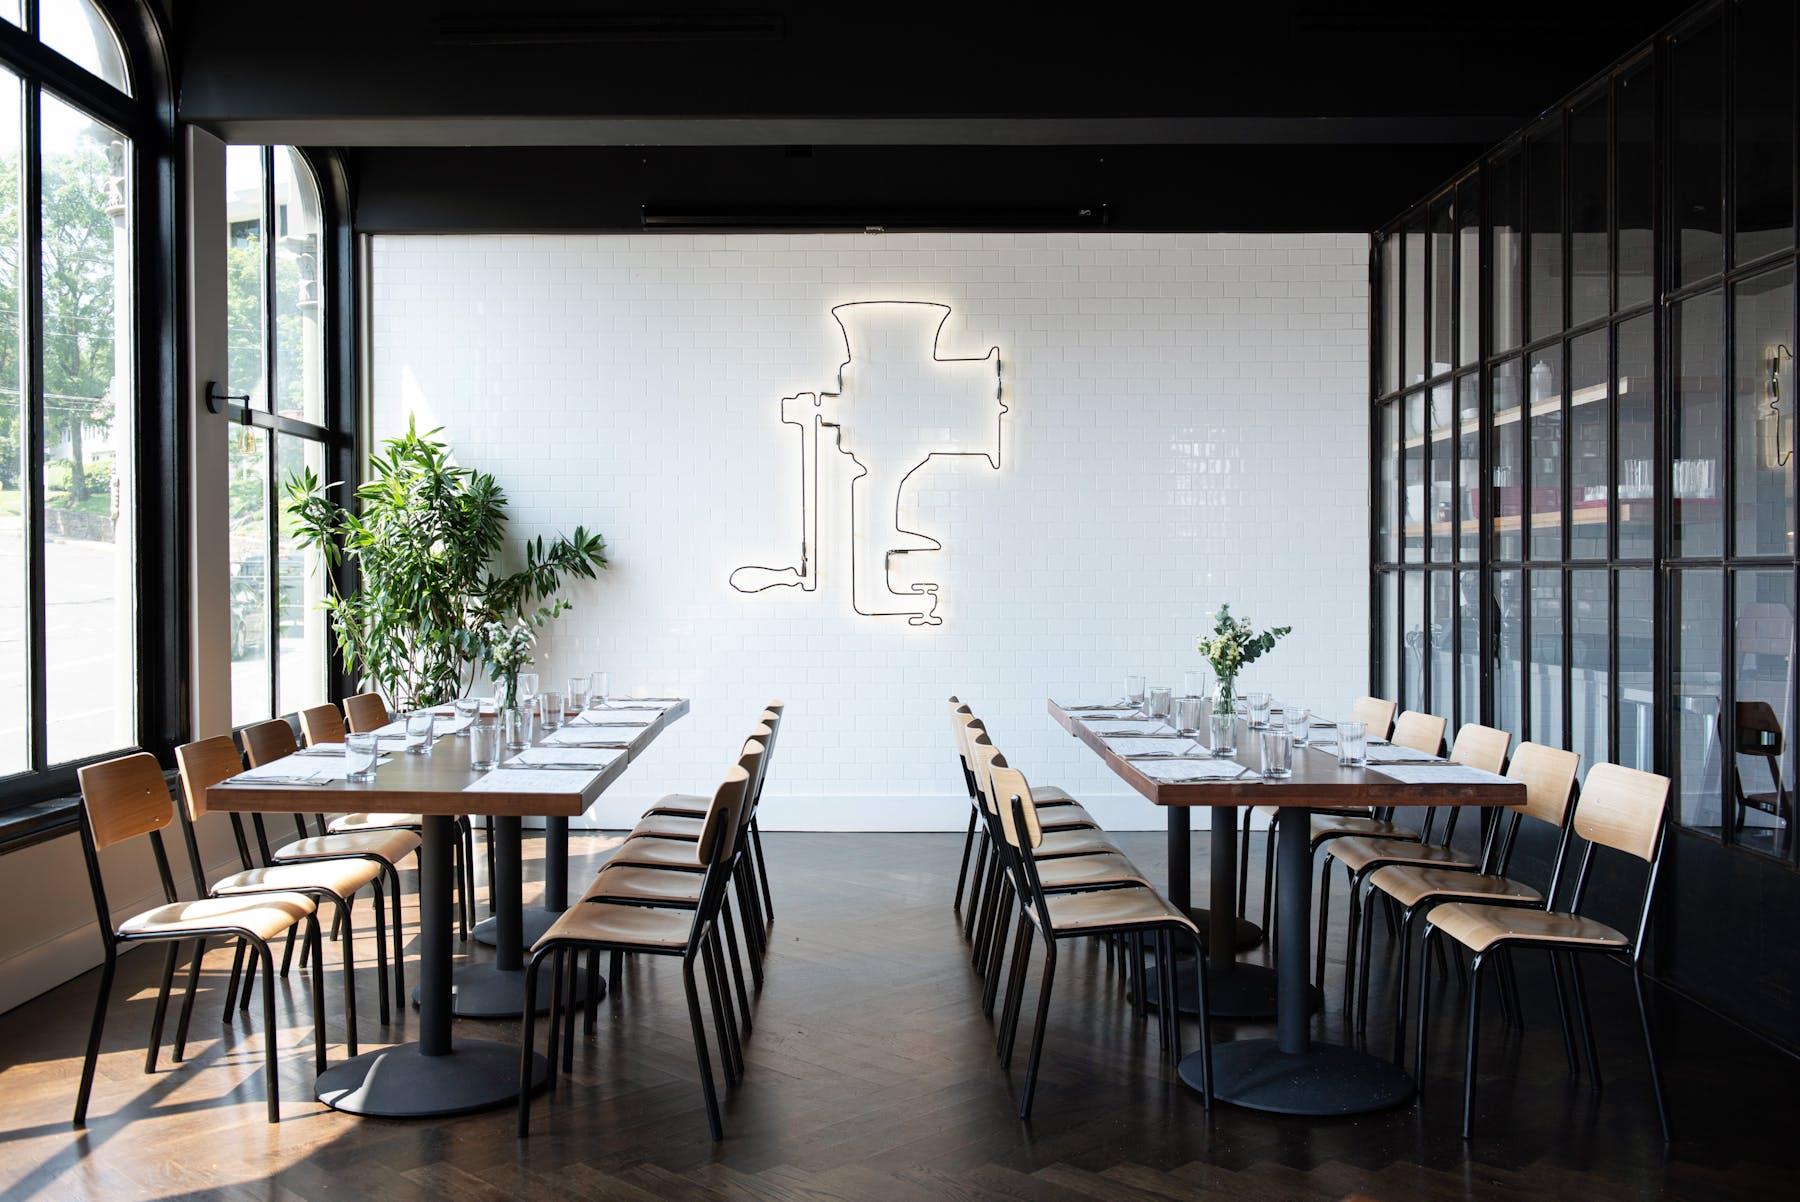 Westport, Ct - Private Dining Room number 1